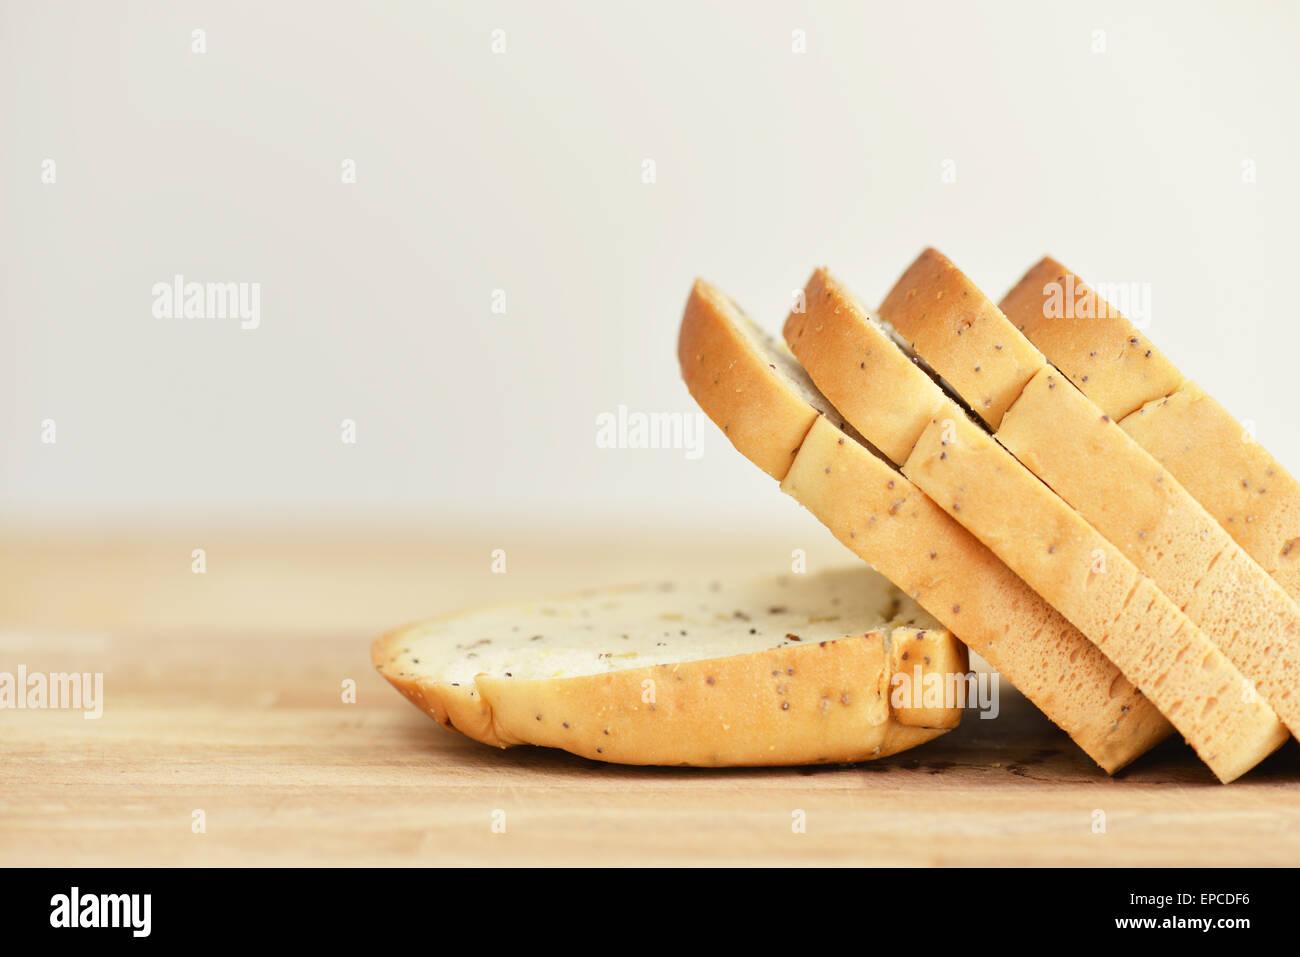 Gluten free bread sliced - Stock Image